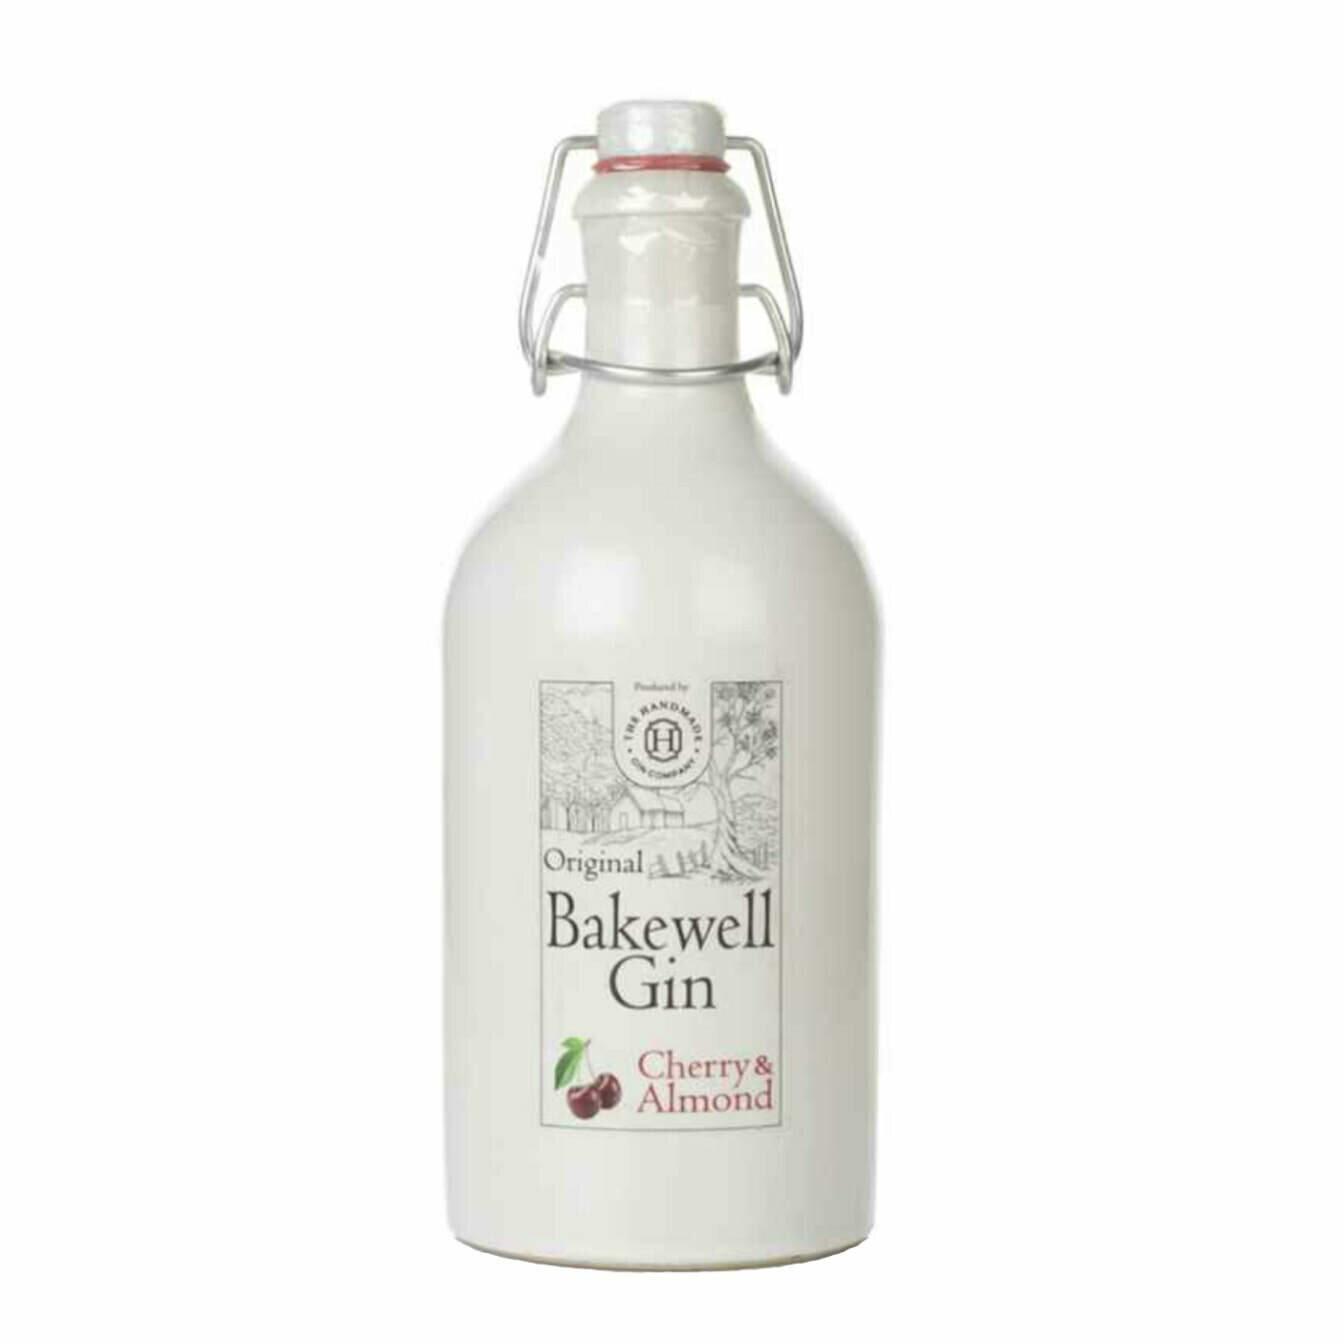 The Handmade Gin Company Bakewell Gin